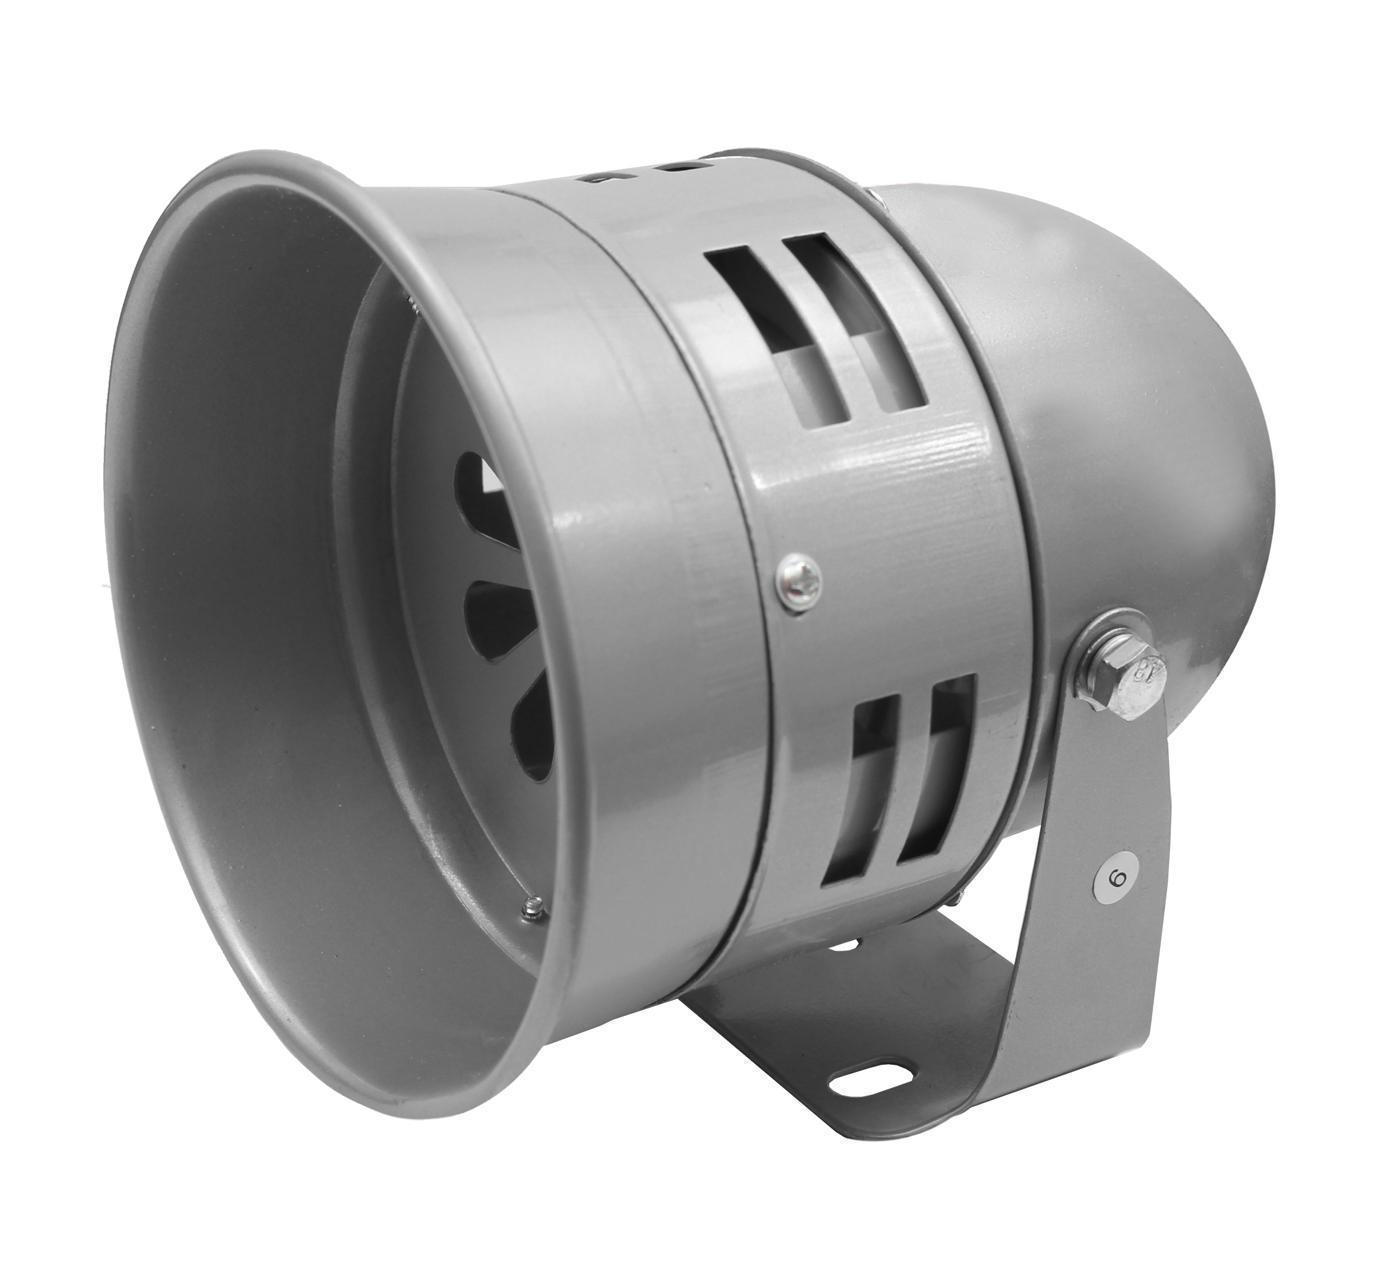 Onpira Motorová elektrická siréna 113db plast Napětí: 12 V